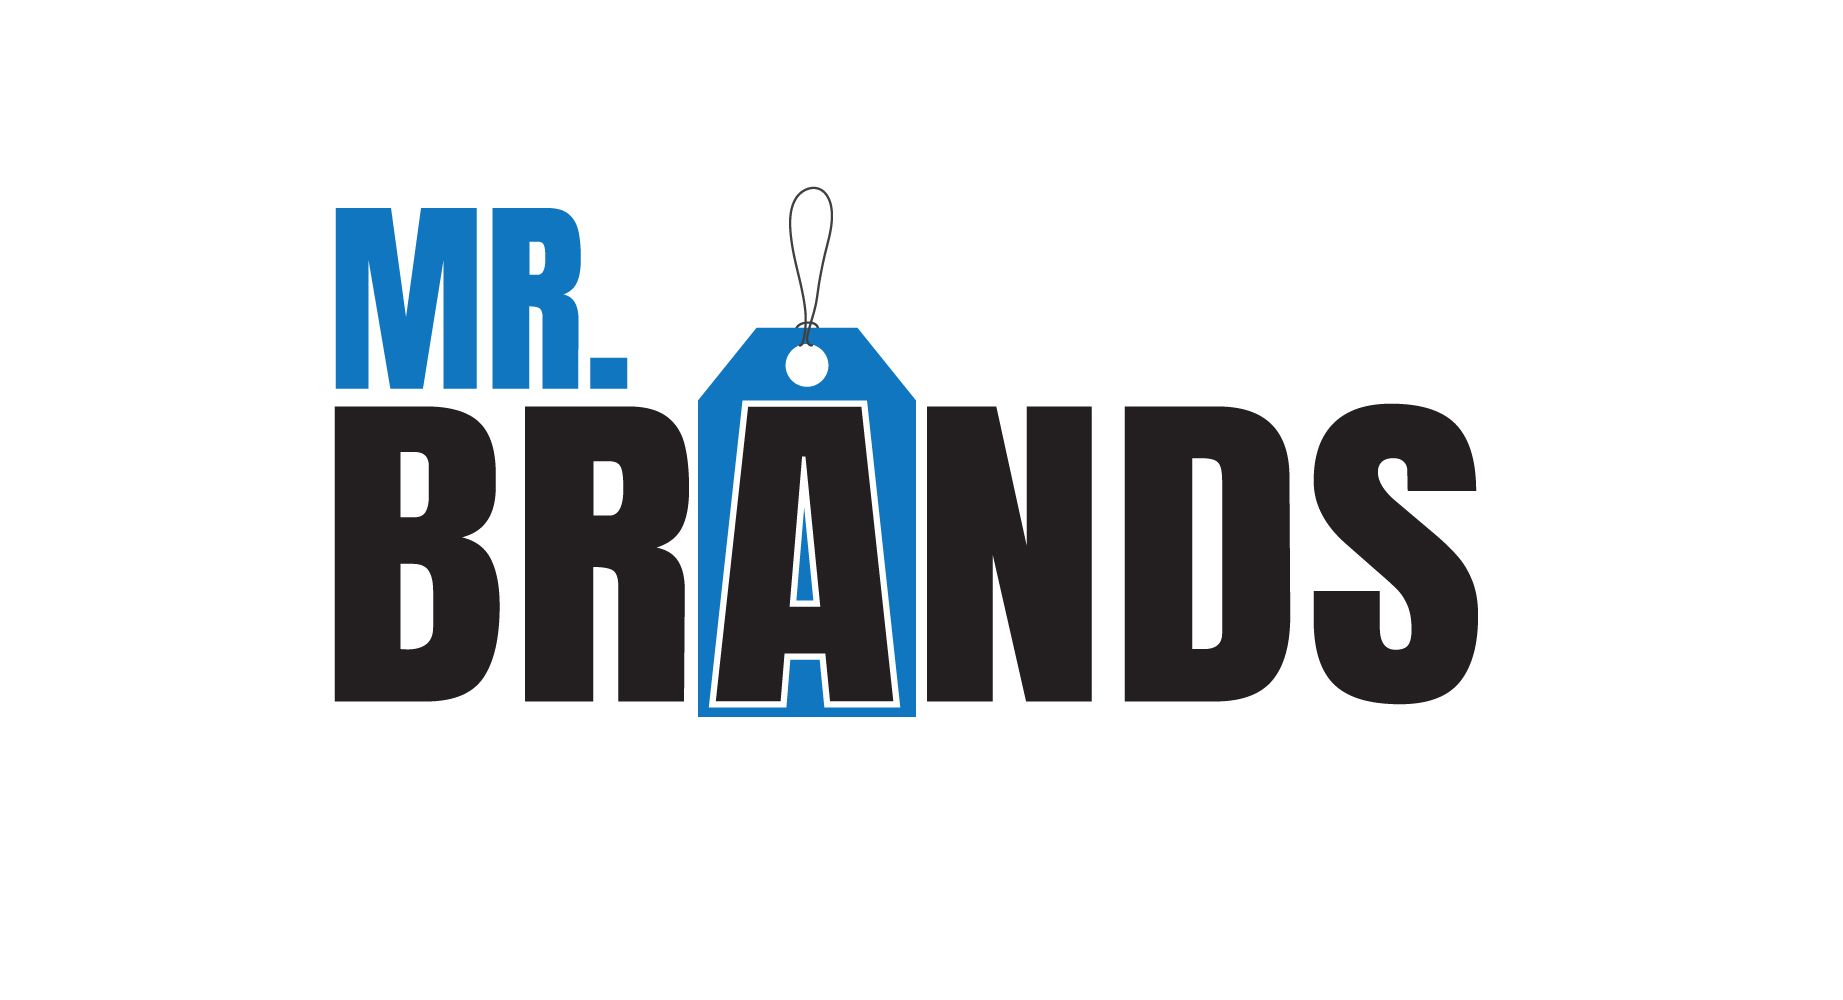 Mr. Brands